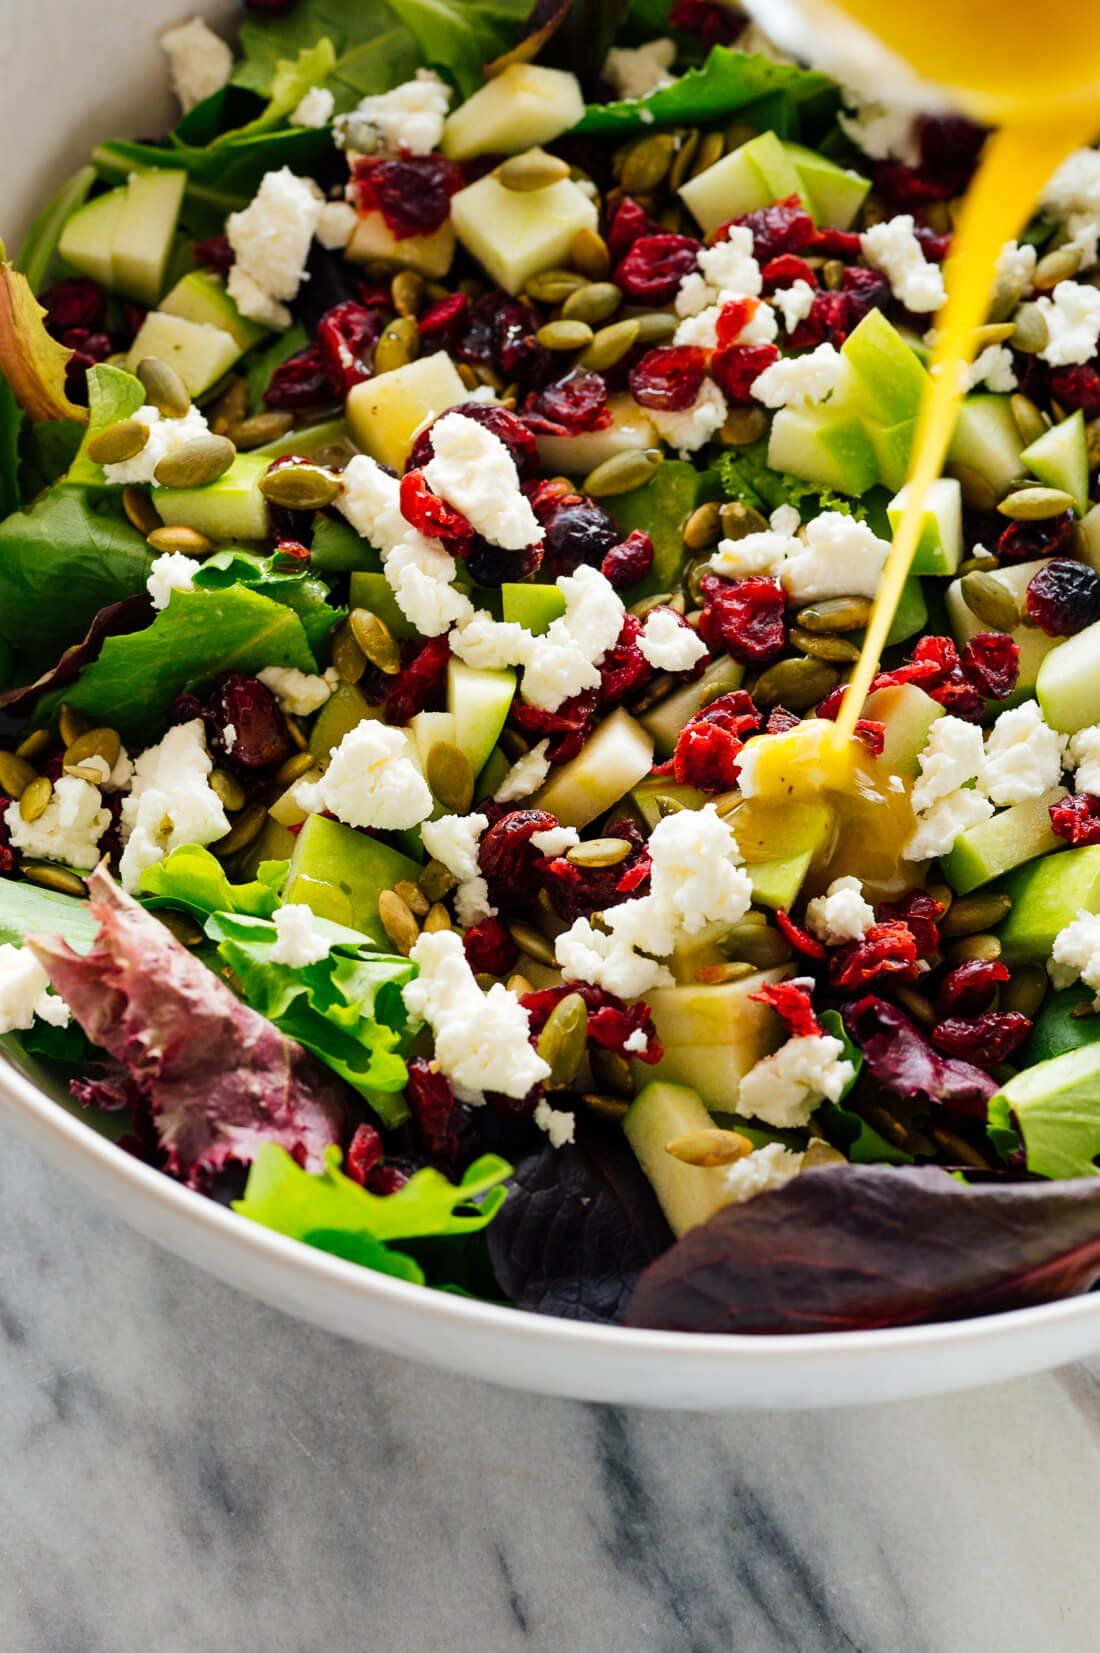 Simple Green Salad My Favorite Recipe Easy Green Salad Recipes Spring Salad Recipes Green Salad Recipes